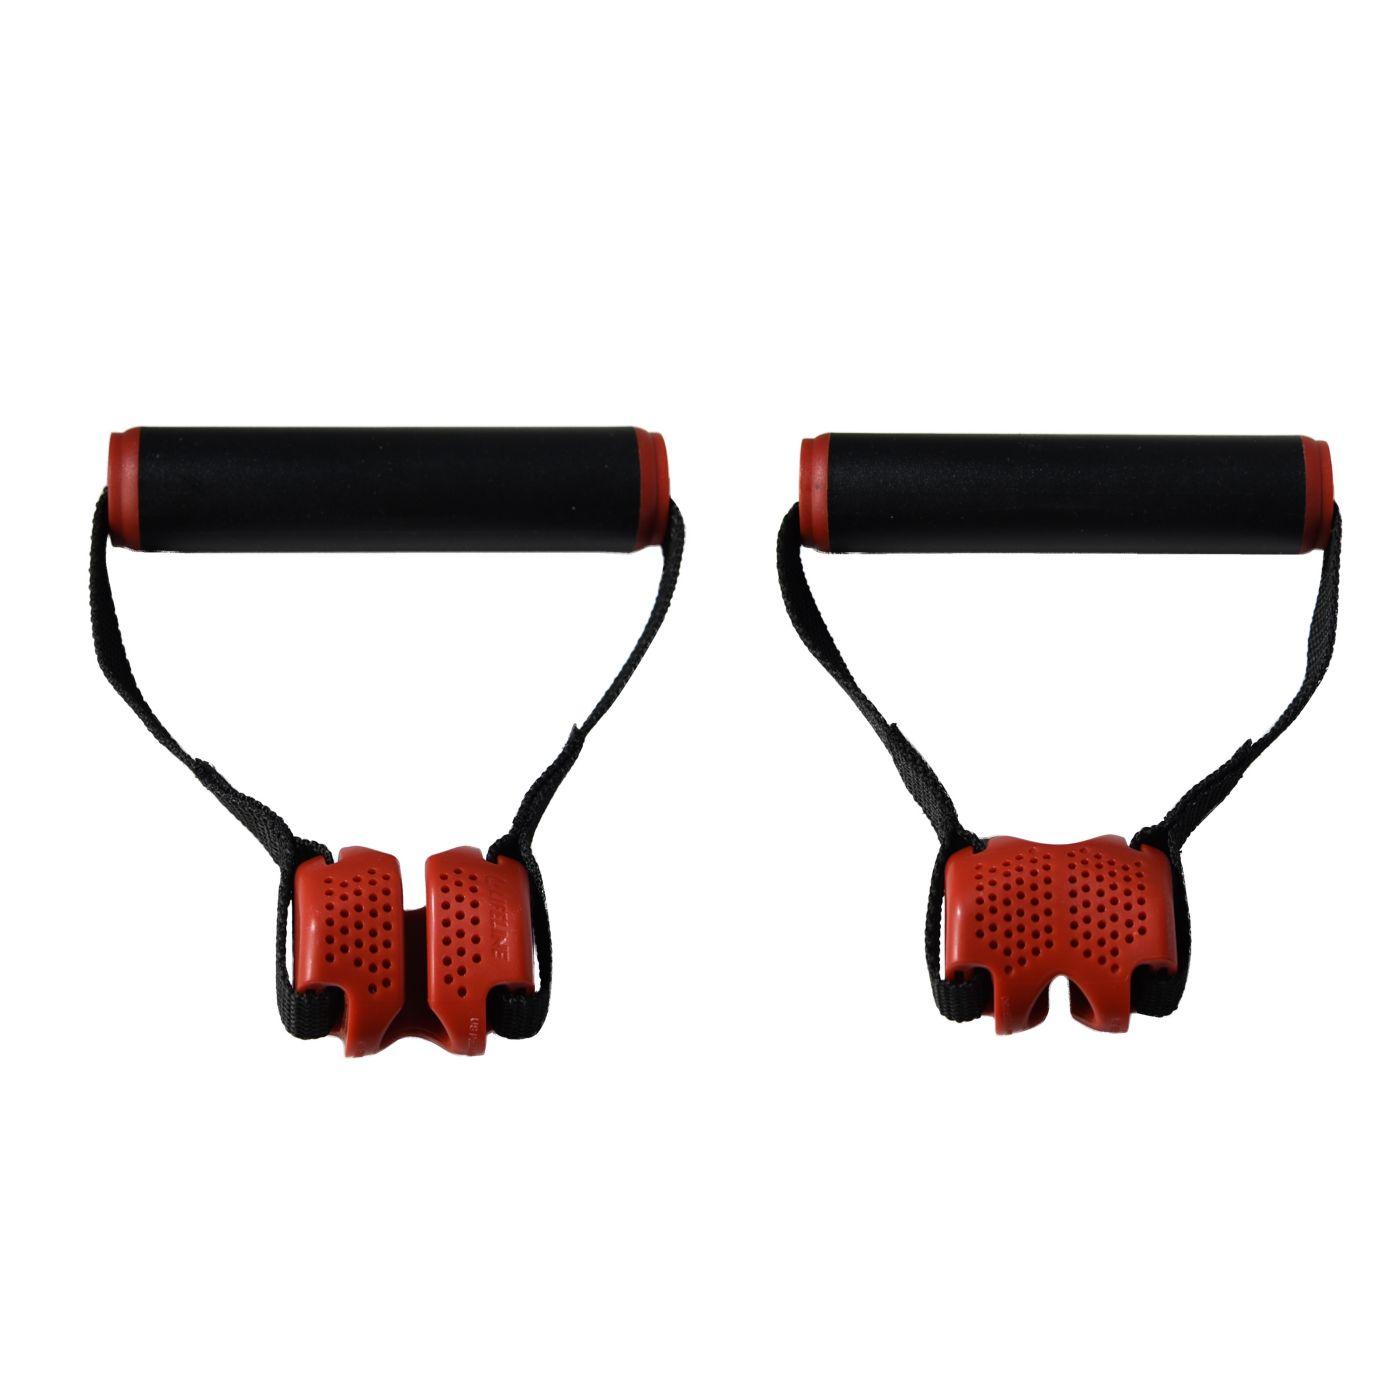 Lifeline Max Flex Handle - Single Cable Pocket